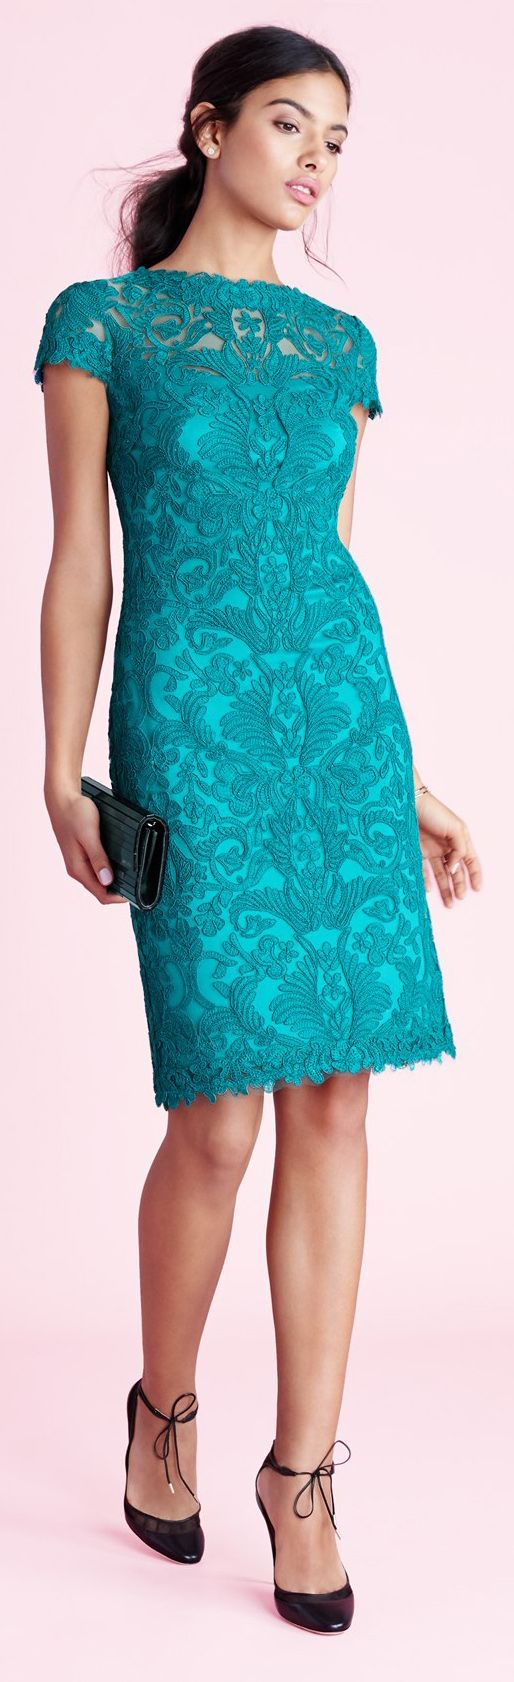 Tadashi Shoji blue turquoise lace dress women fashion outfit ...